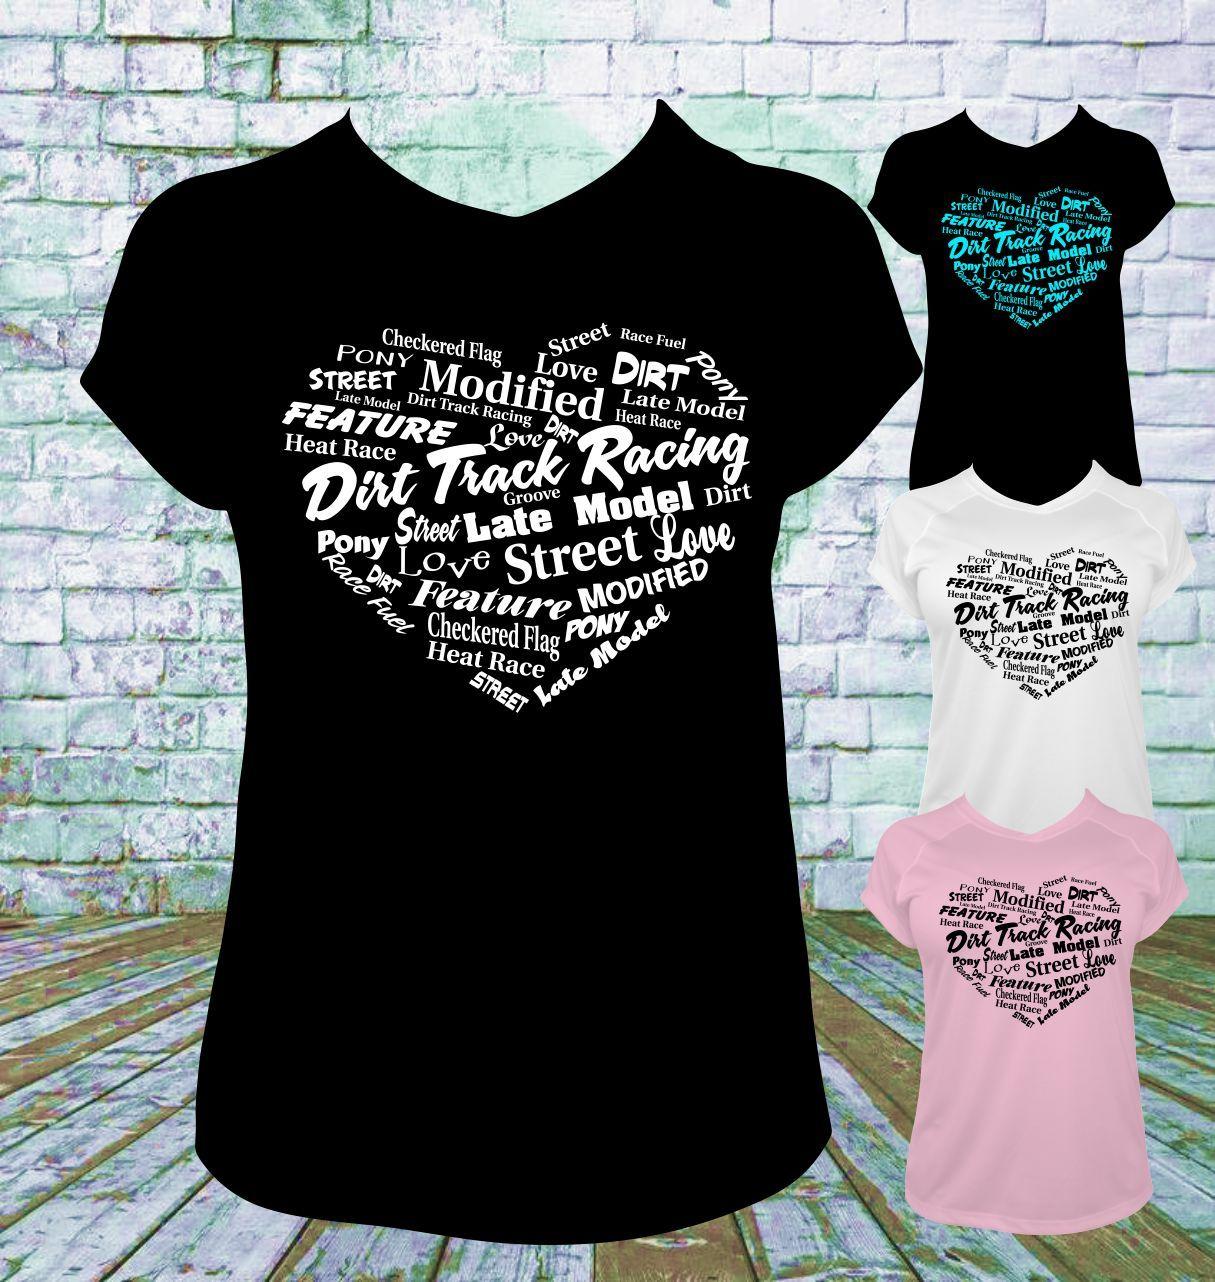 dirt track racing subway heart t shirt - Racing T Shirt Design Ideas